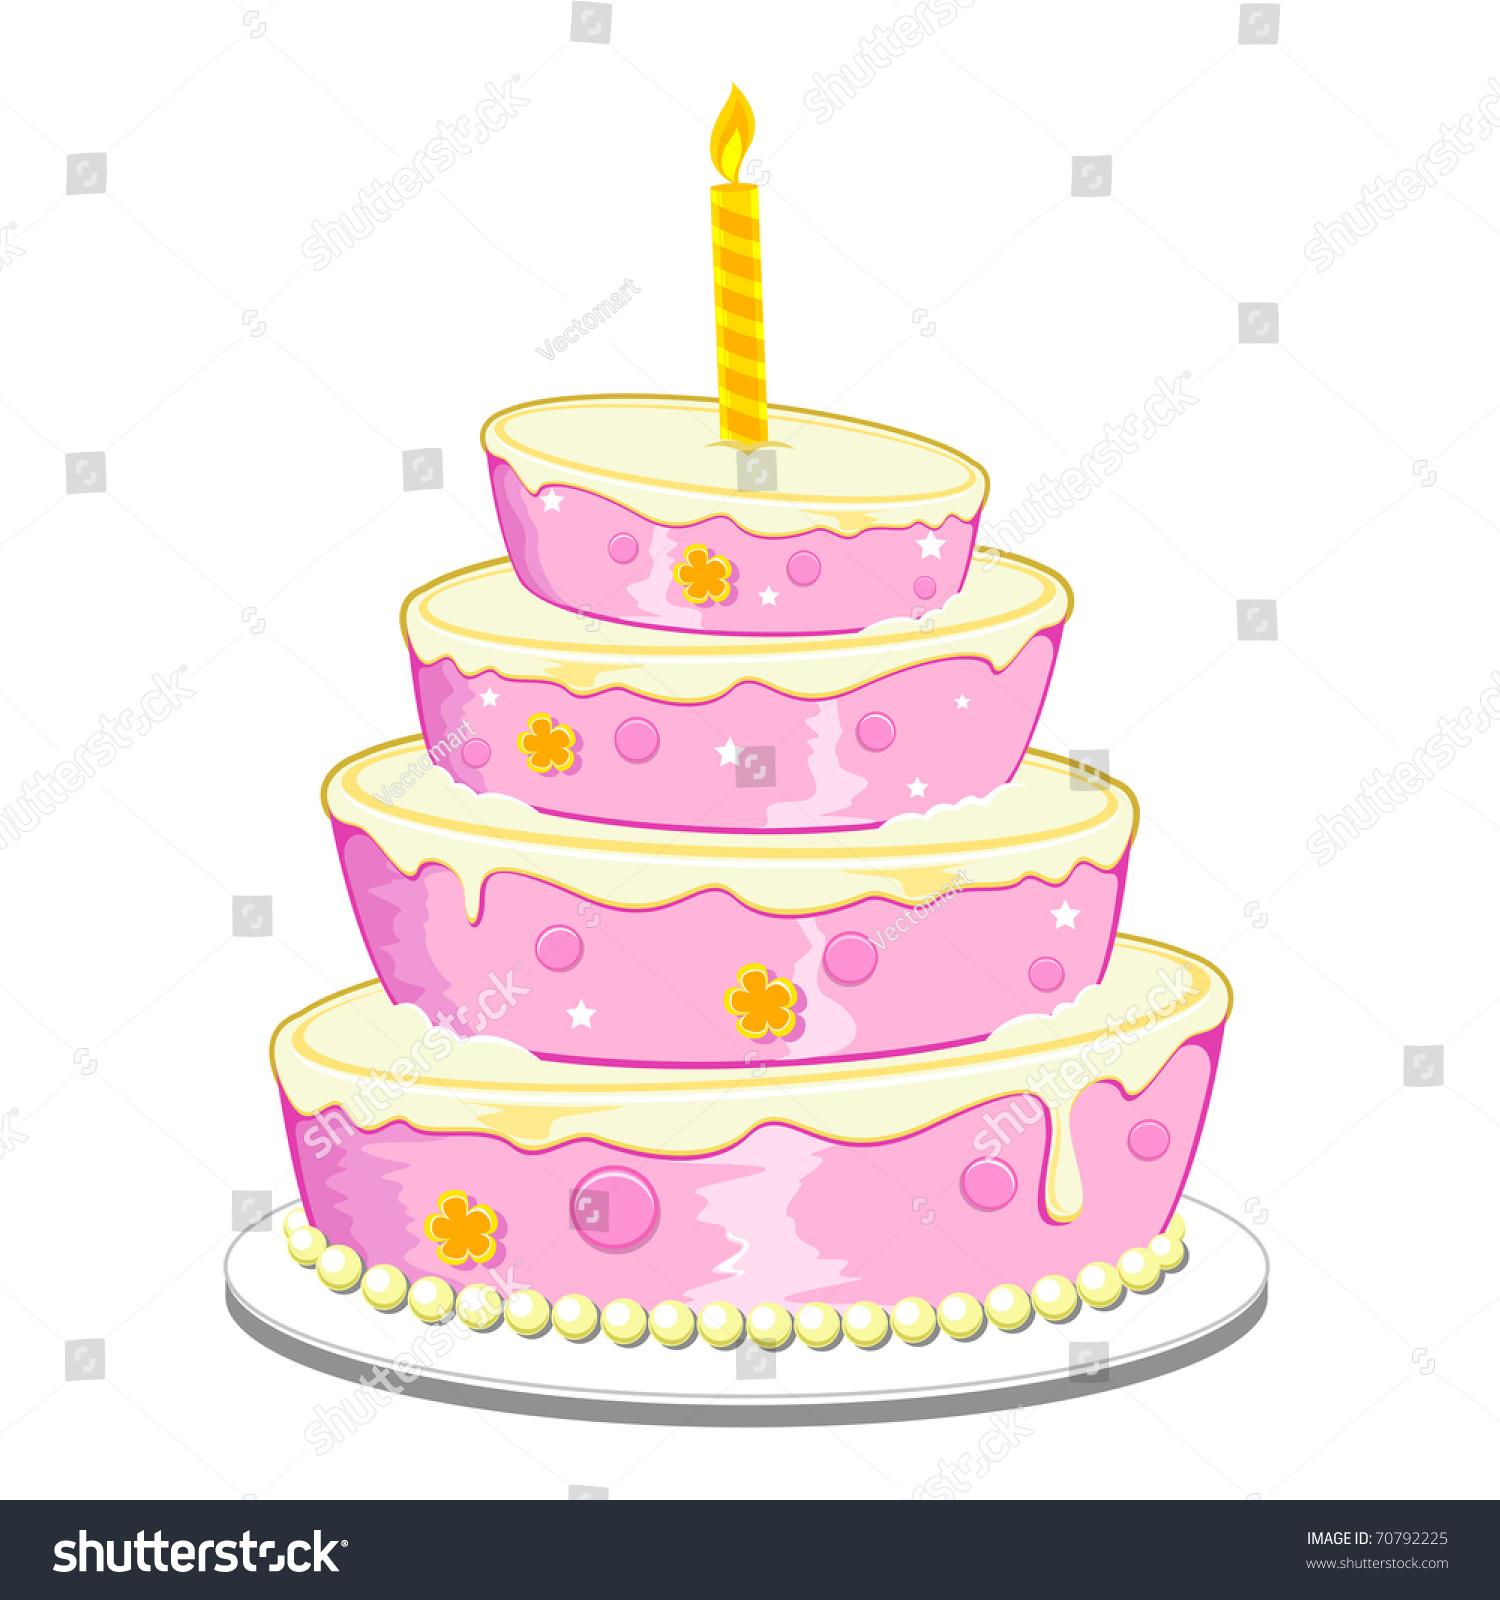 Cake With Image Editor